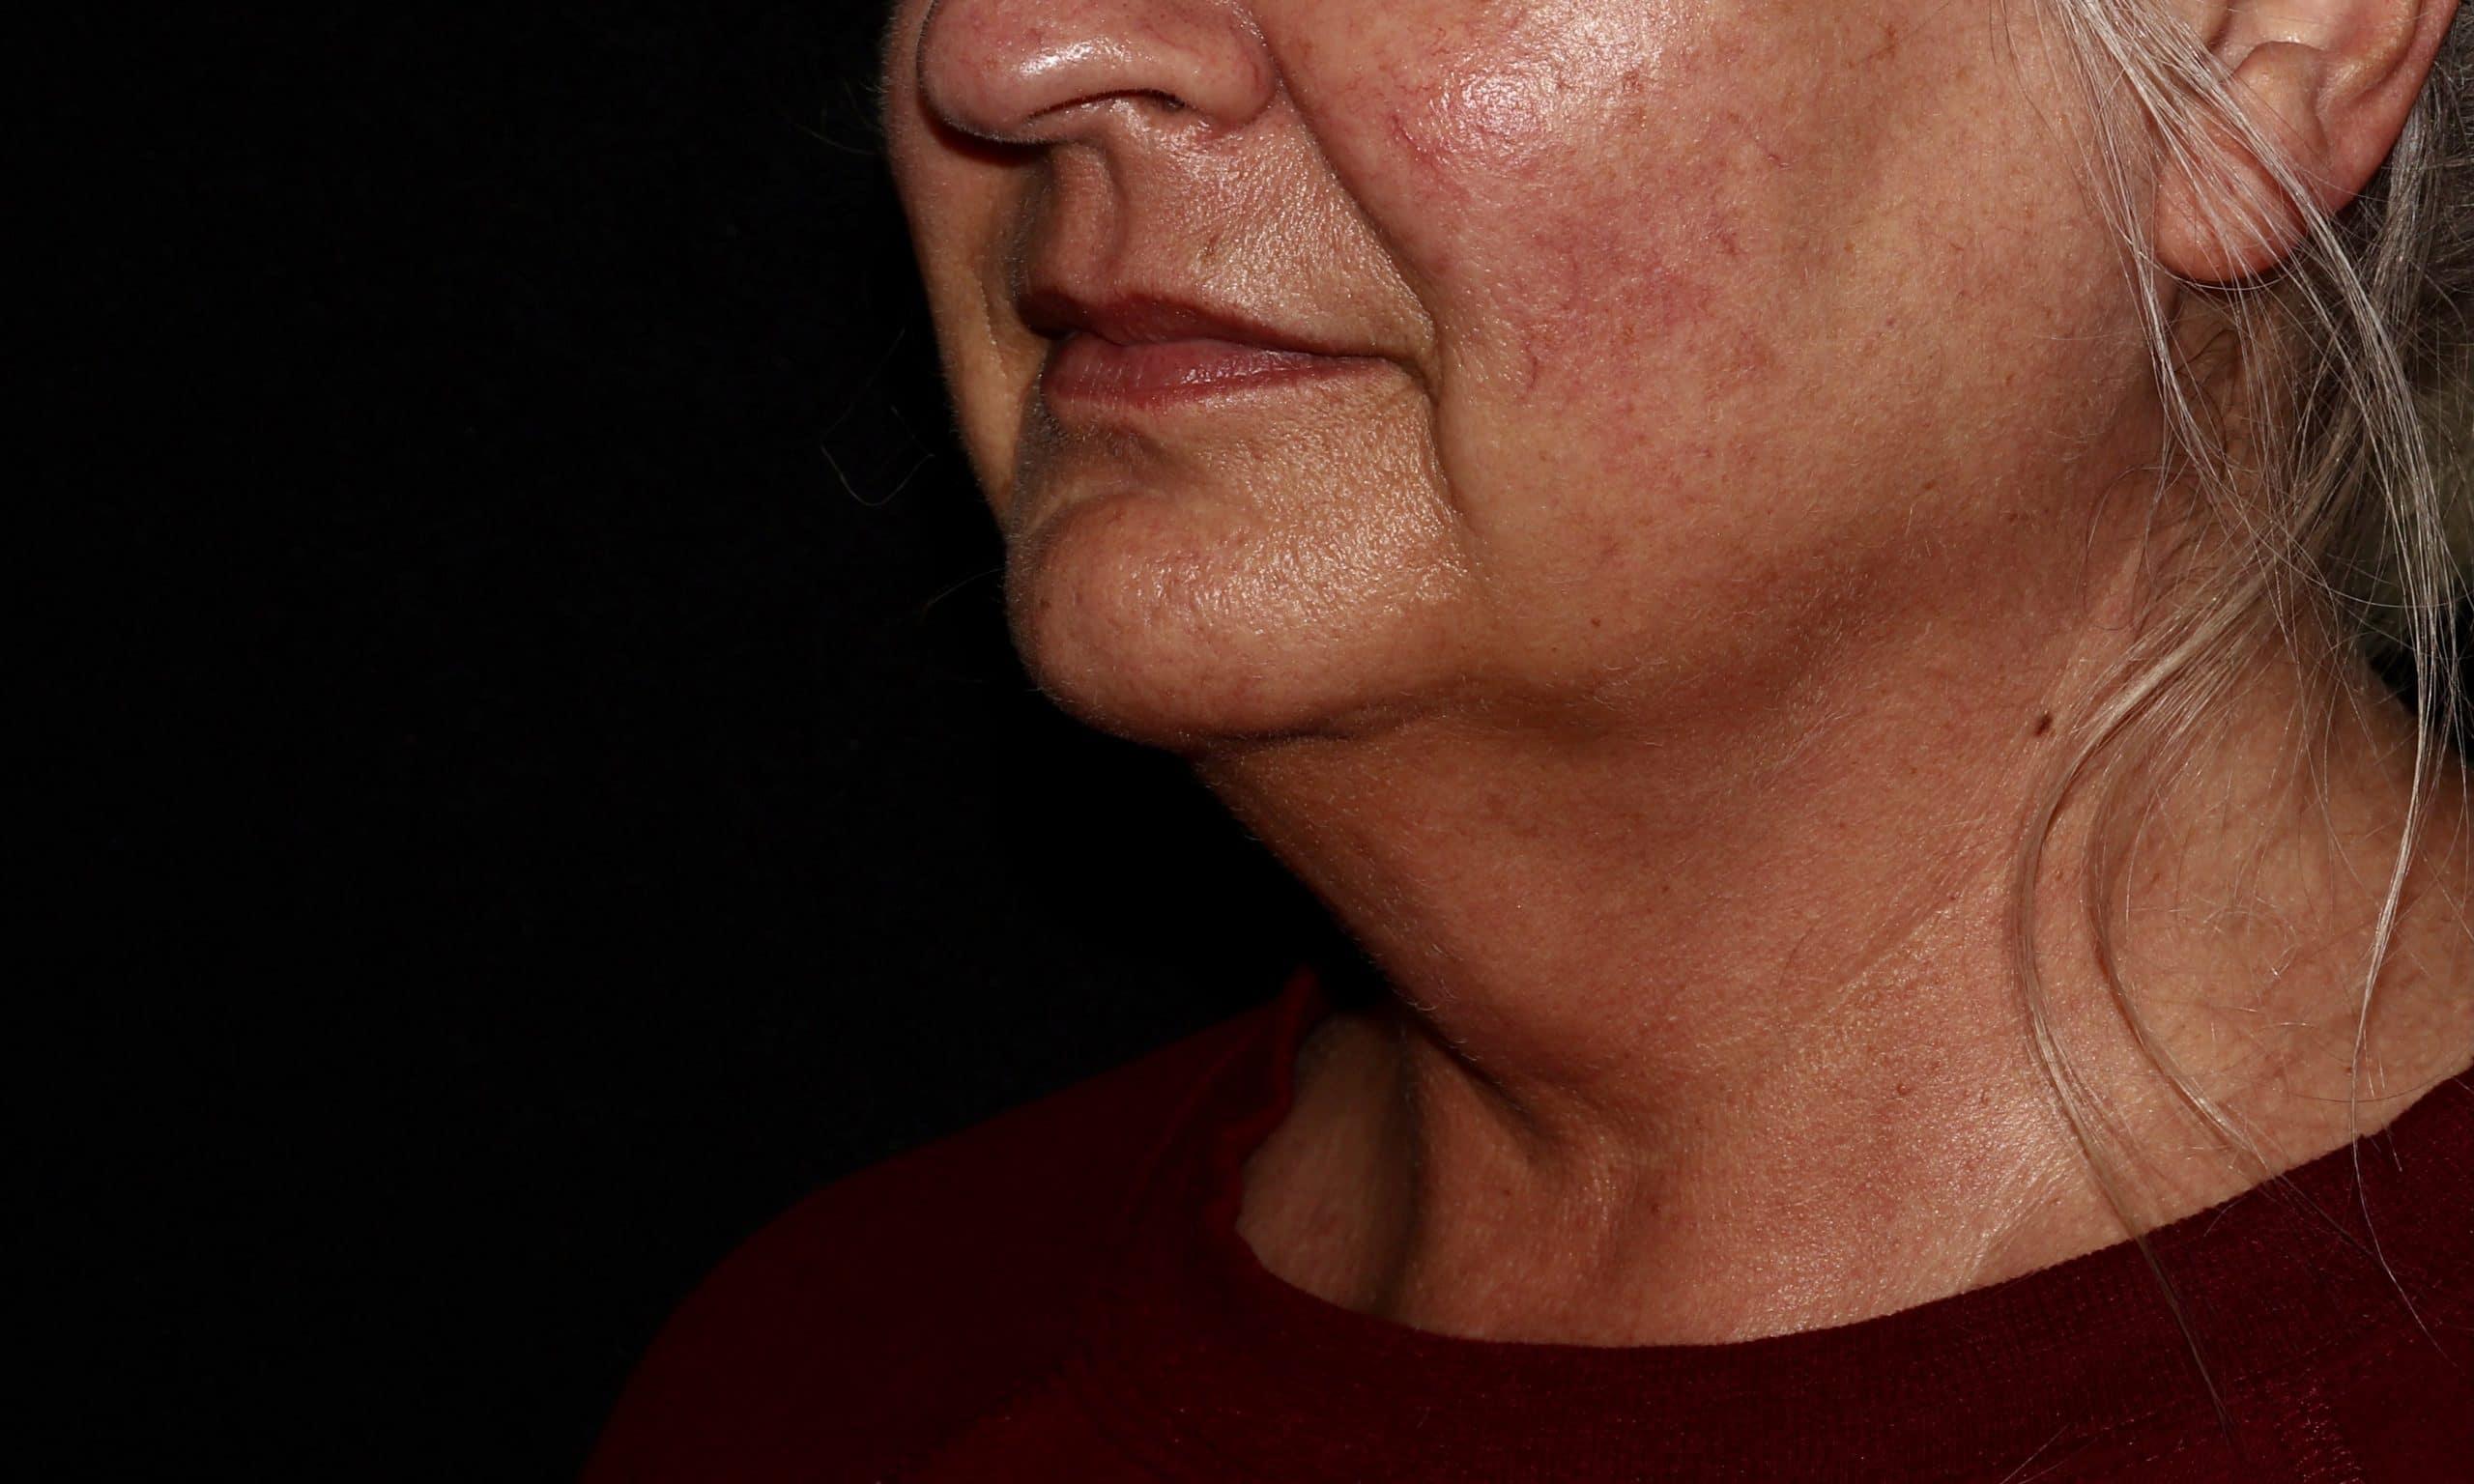 Coolsculpting Neck Treatment Before